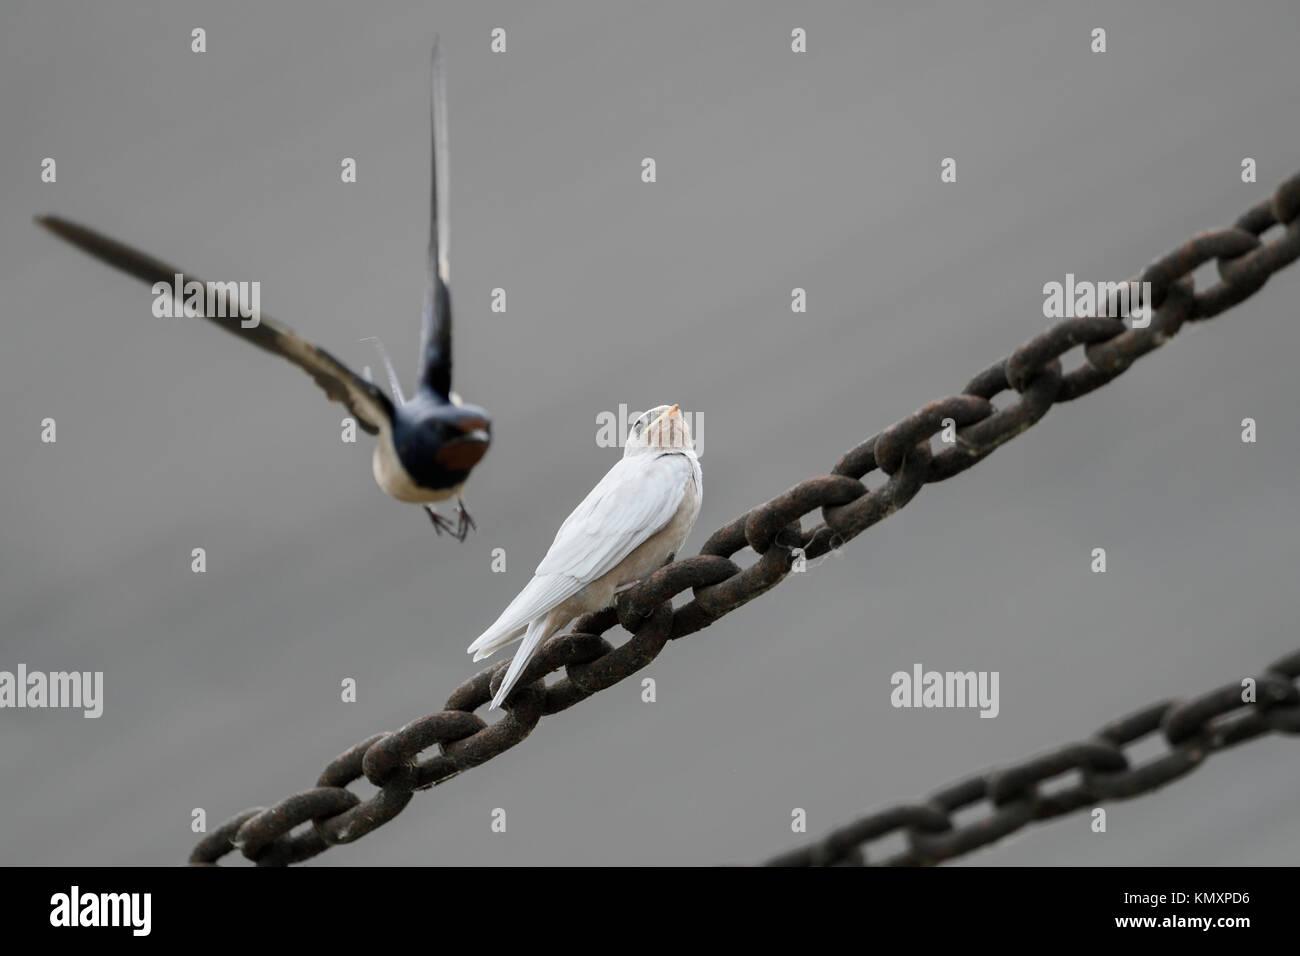 Barn Swallow / Rauchschwalbe ( Hirundo rustica ), fledged, white plumage, gene mutation, leucistic, leucism, with - Stock Image